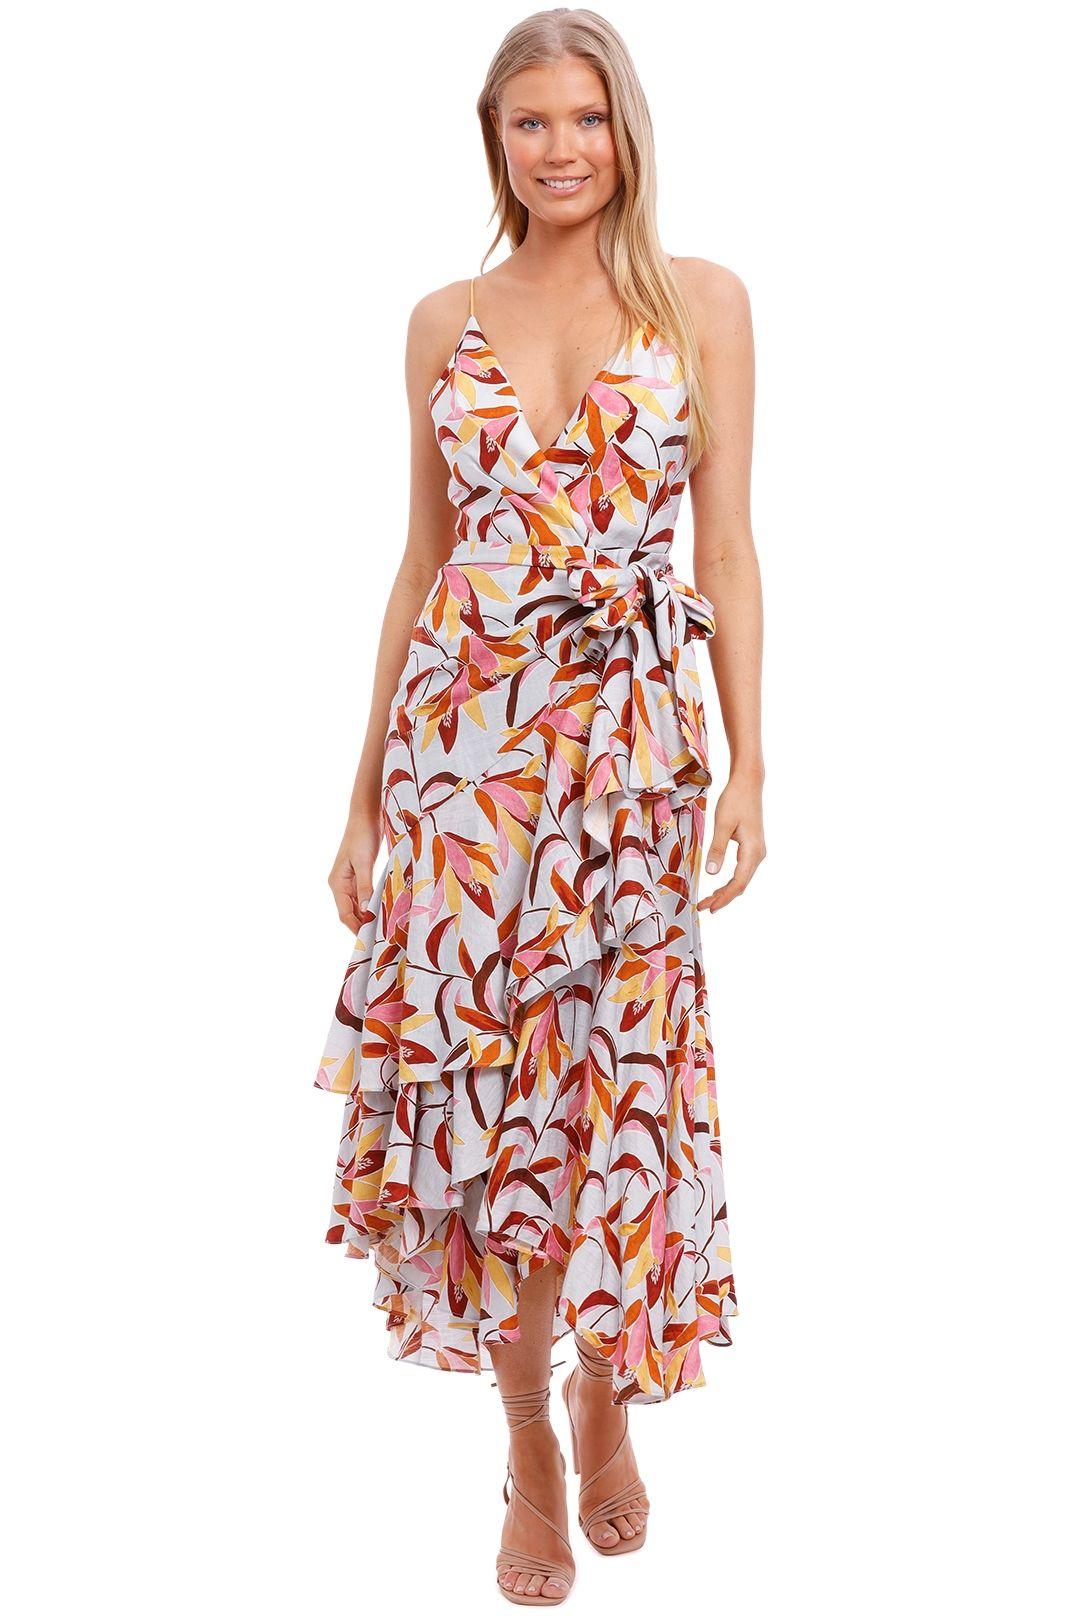 Acler Marlay Dress floral print